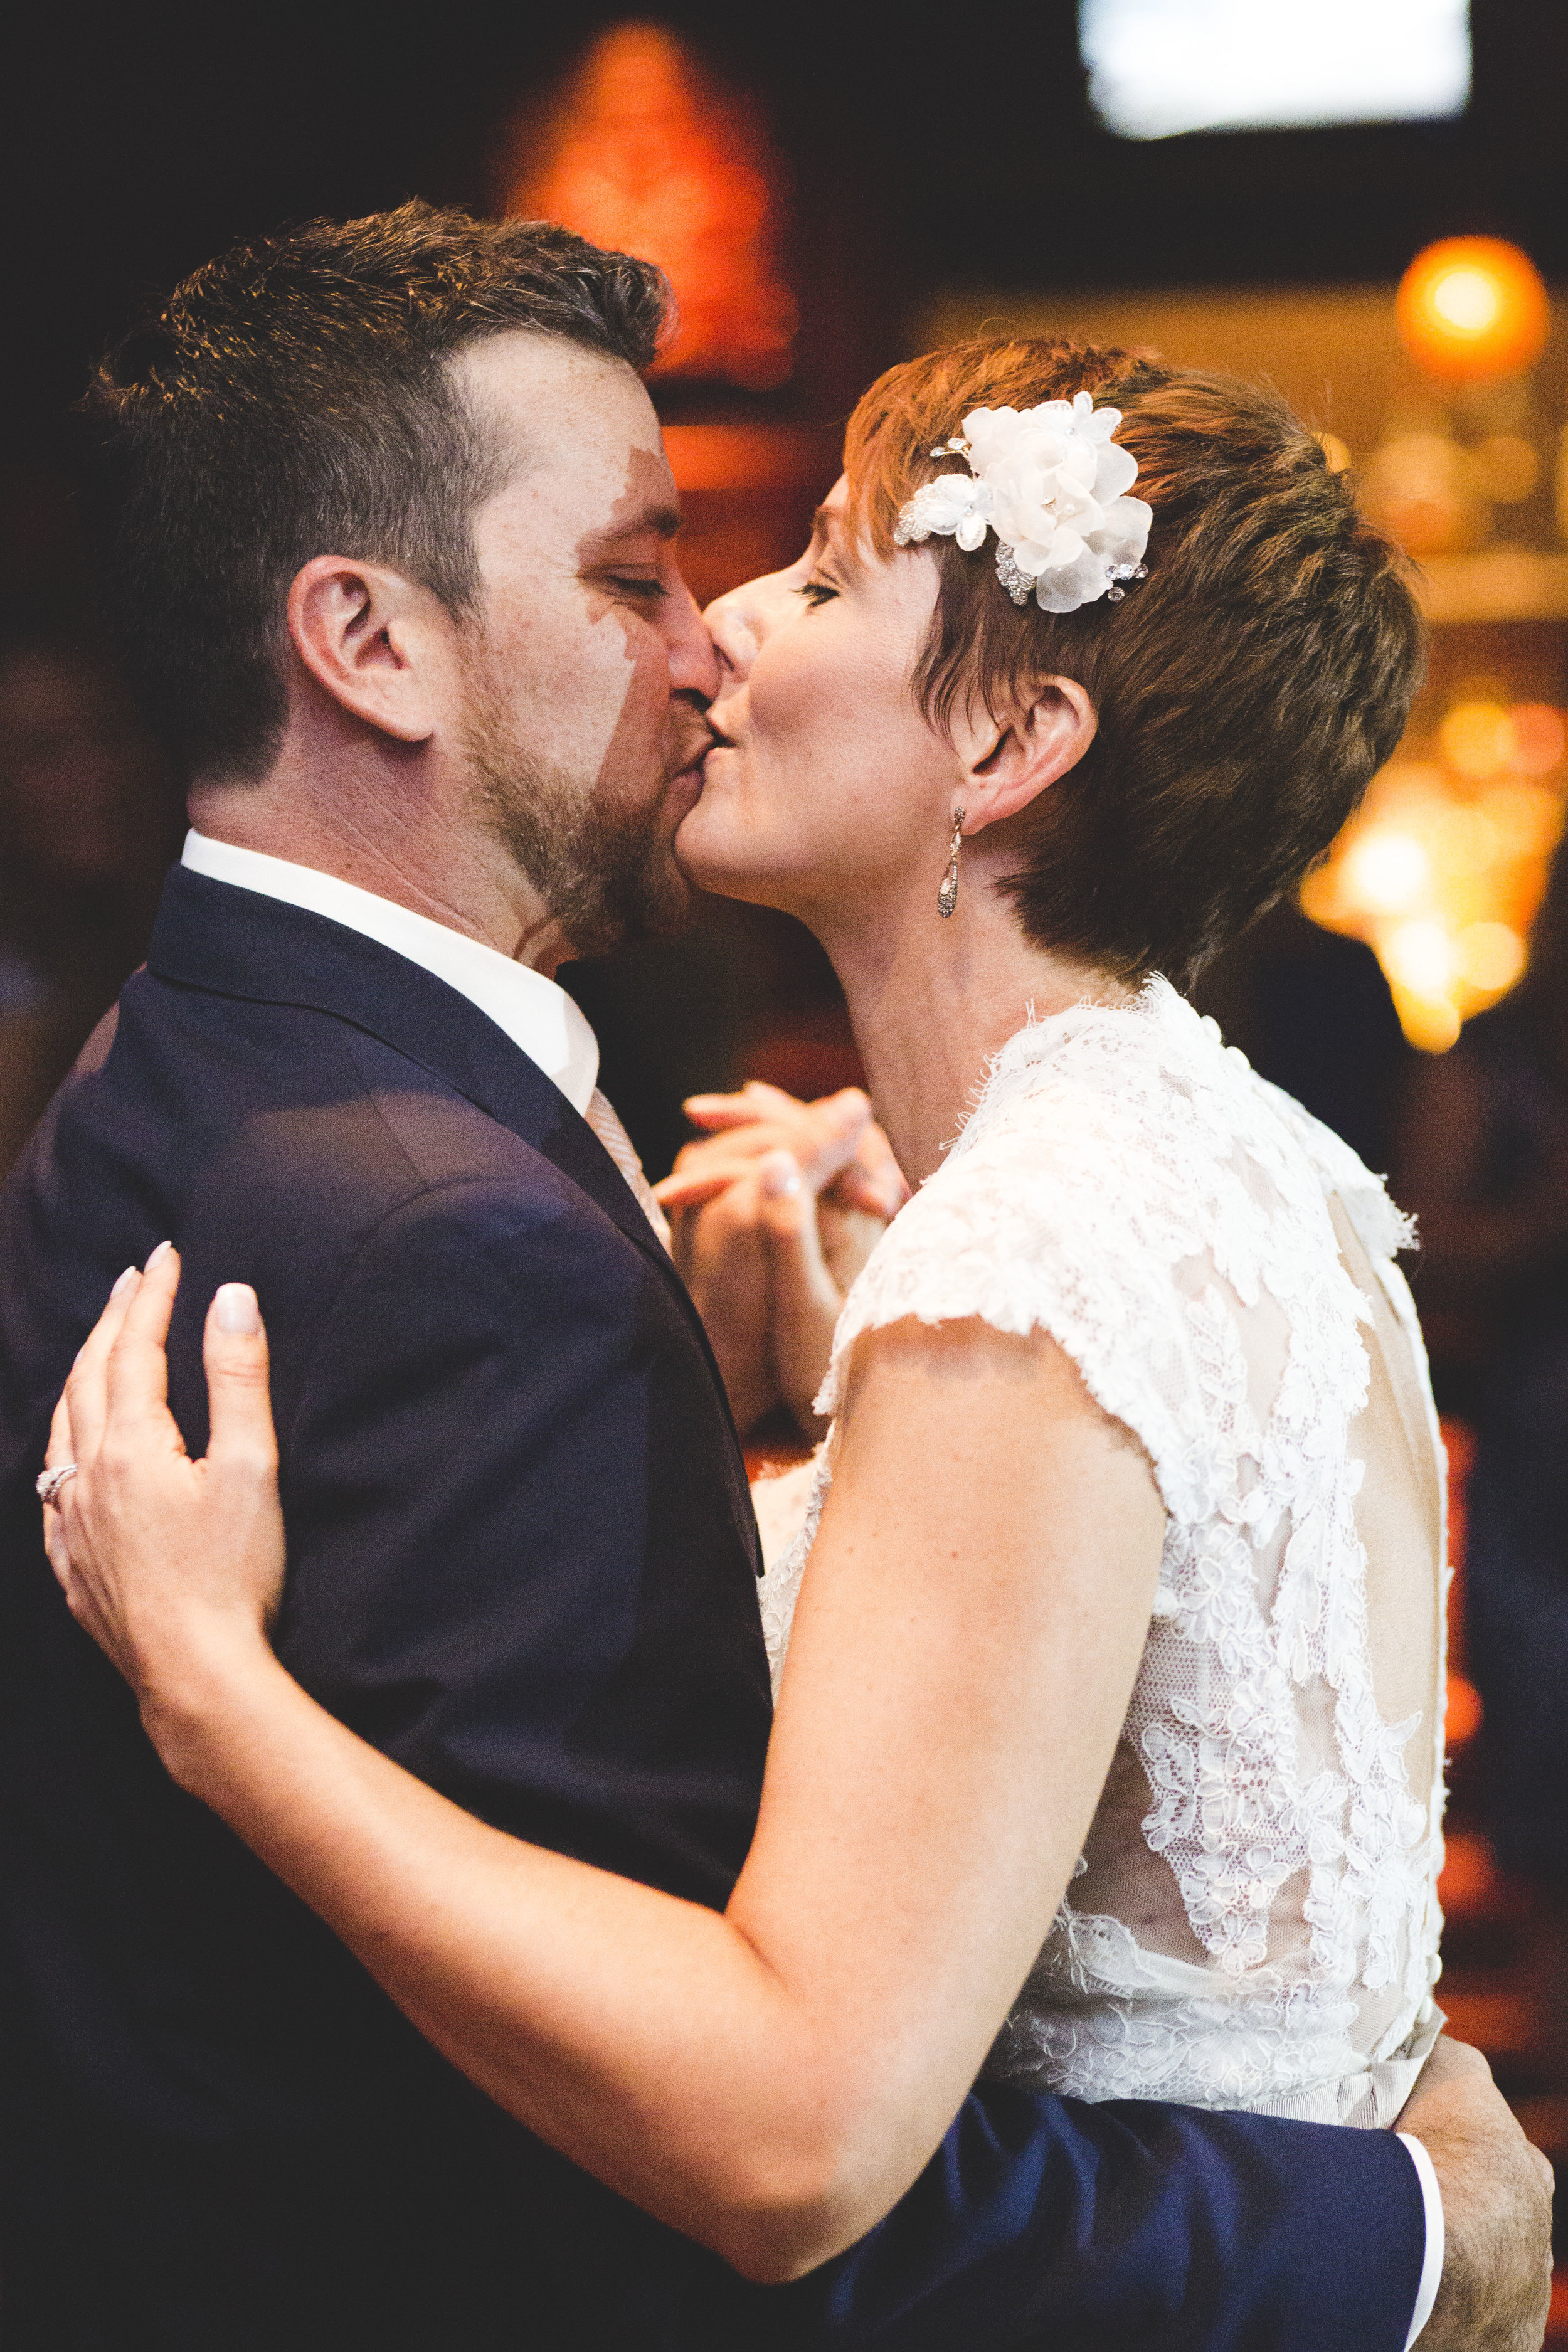 ATGI_Kat and Gabe Wedding 2016_IMG_1118.jpg